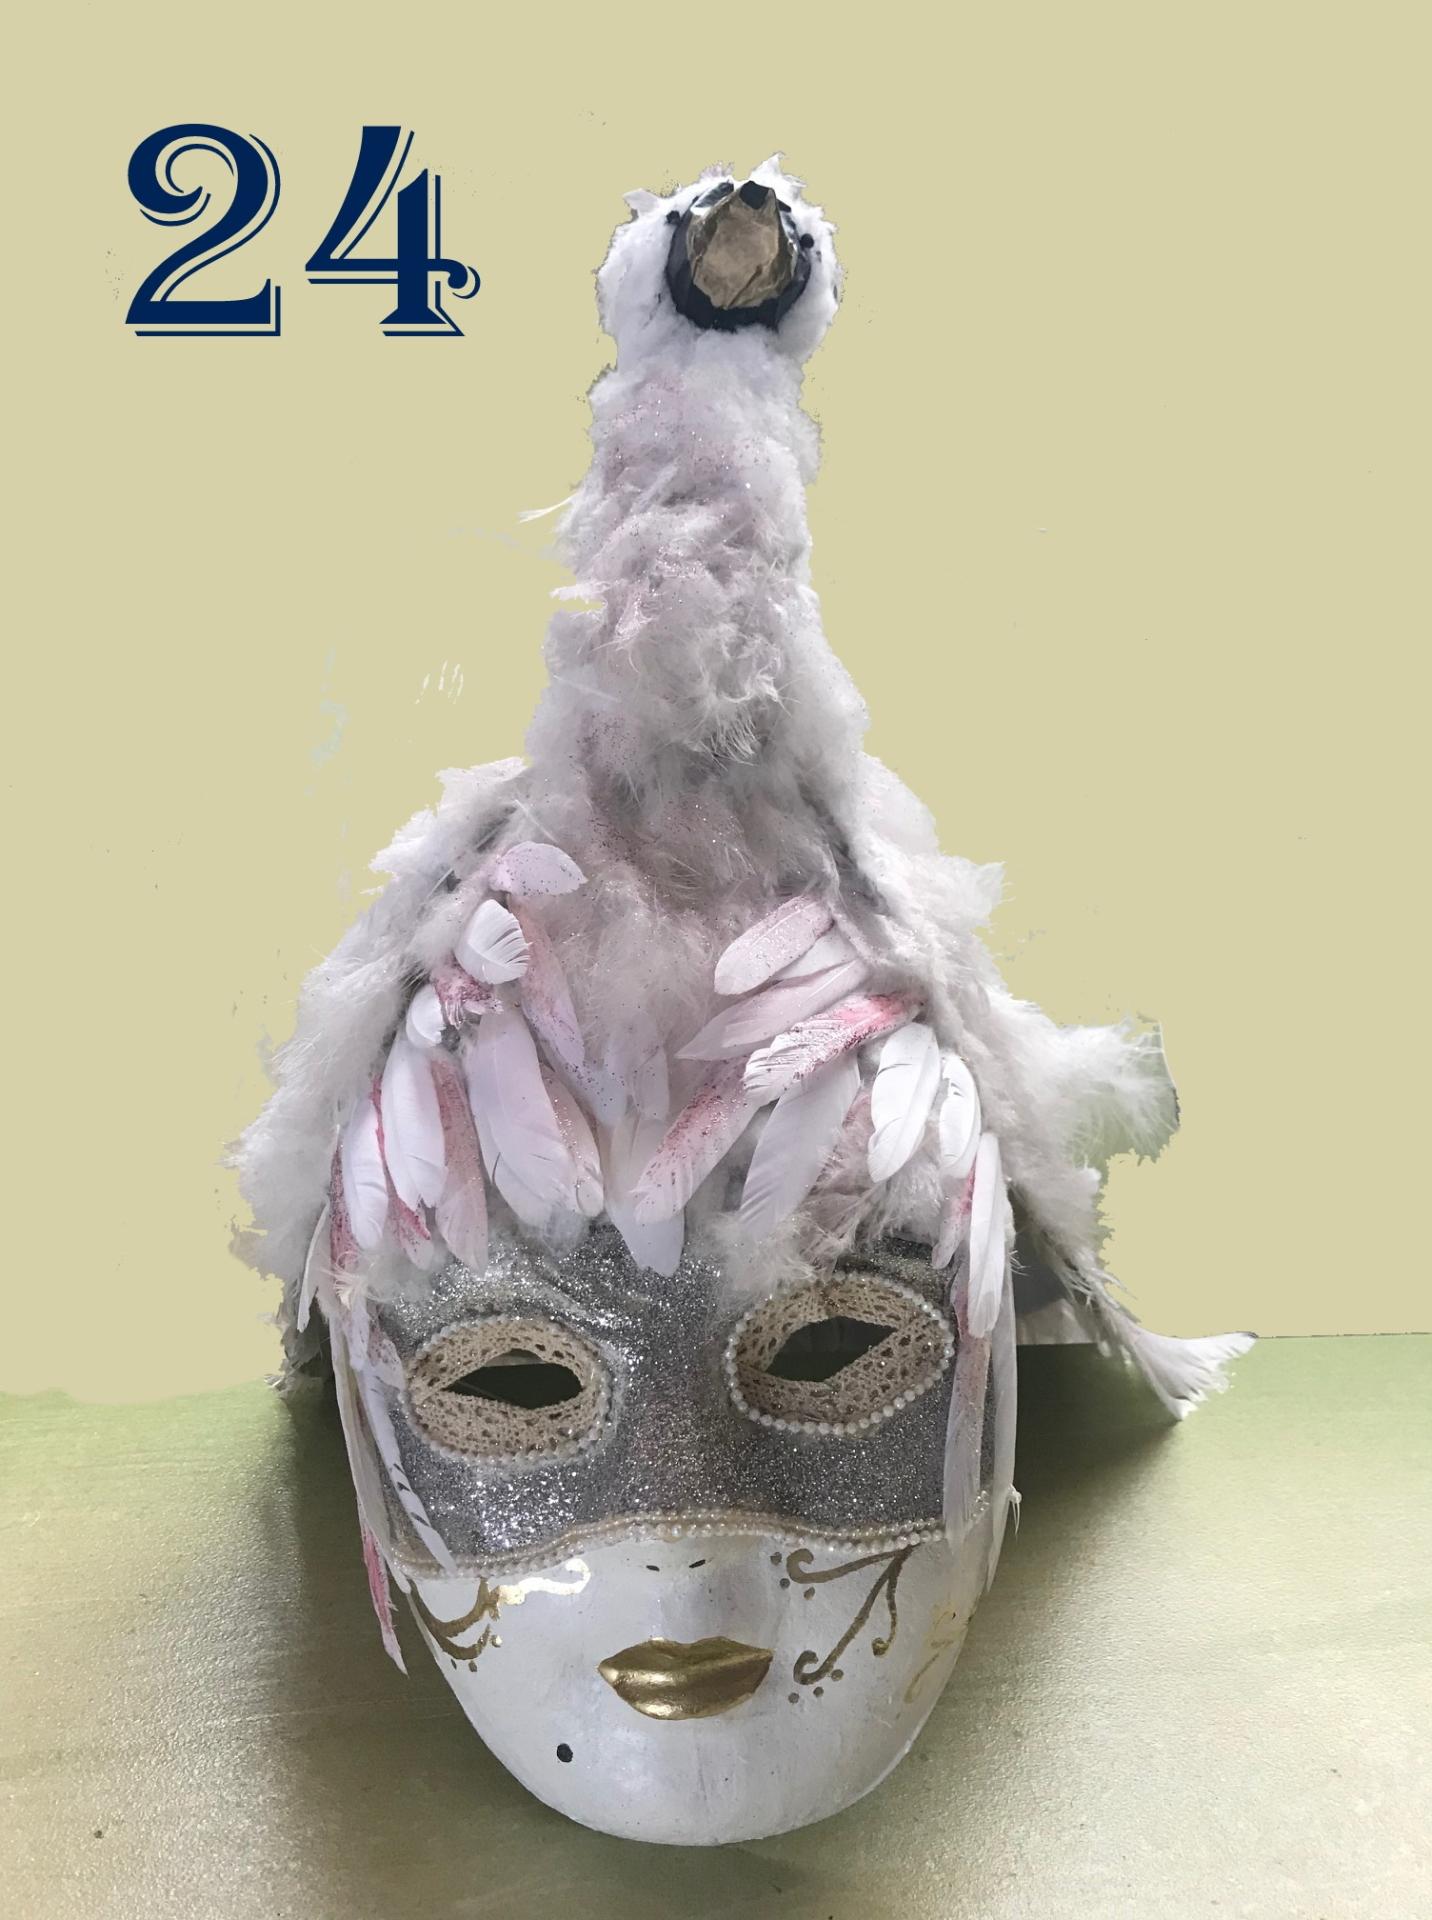 Maschera 24